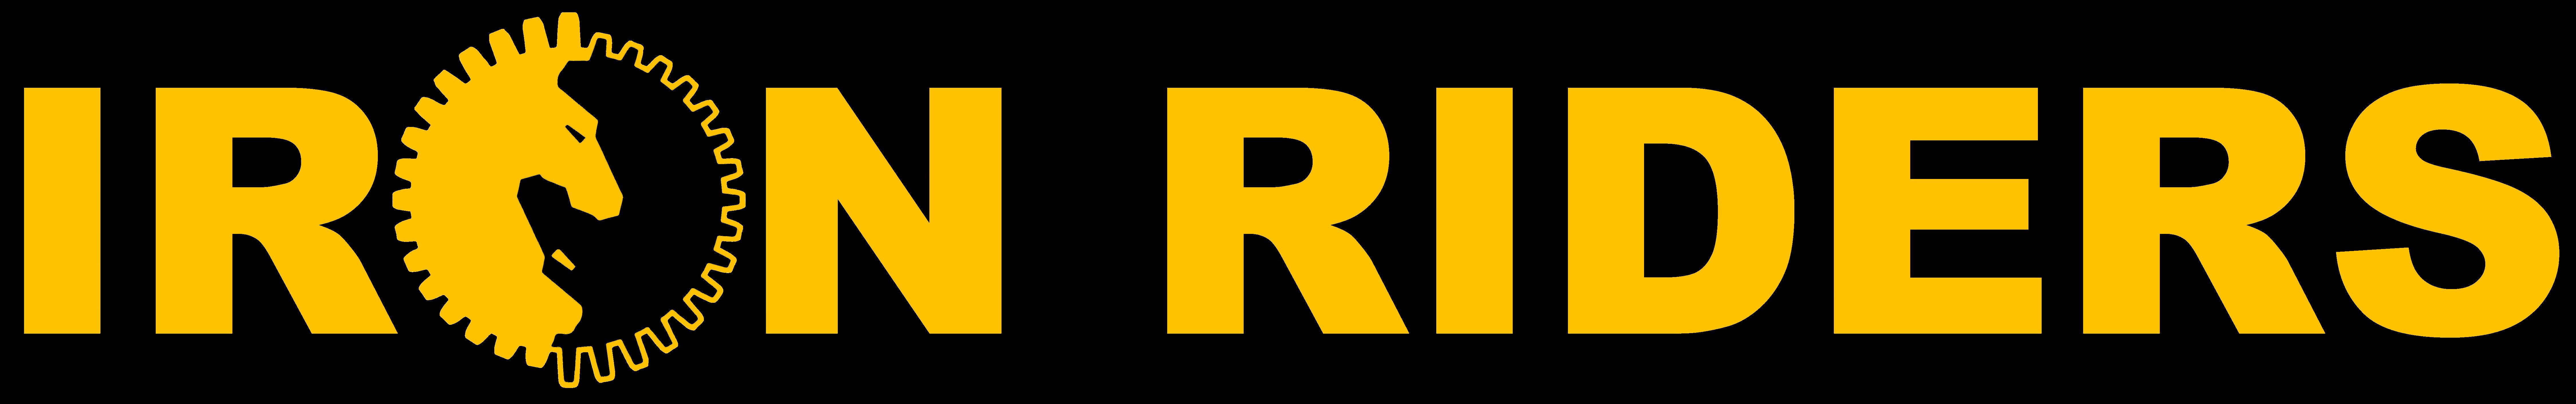 Iron Riders 4180